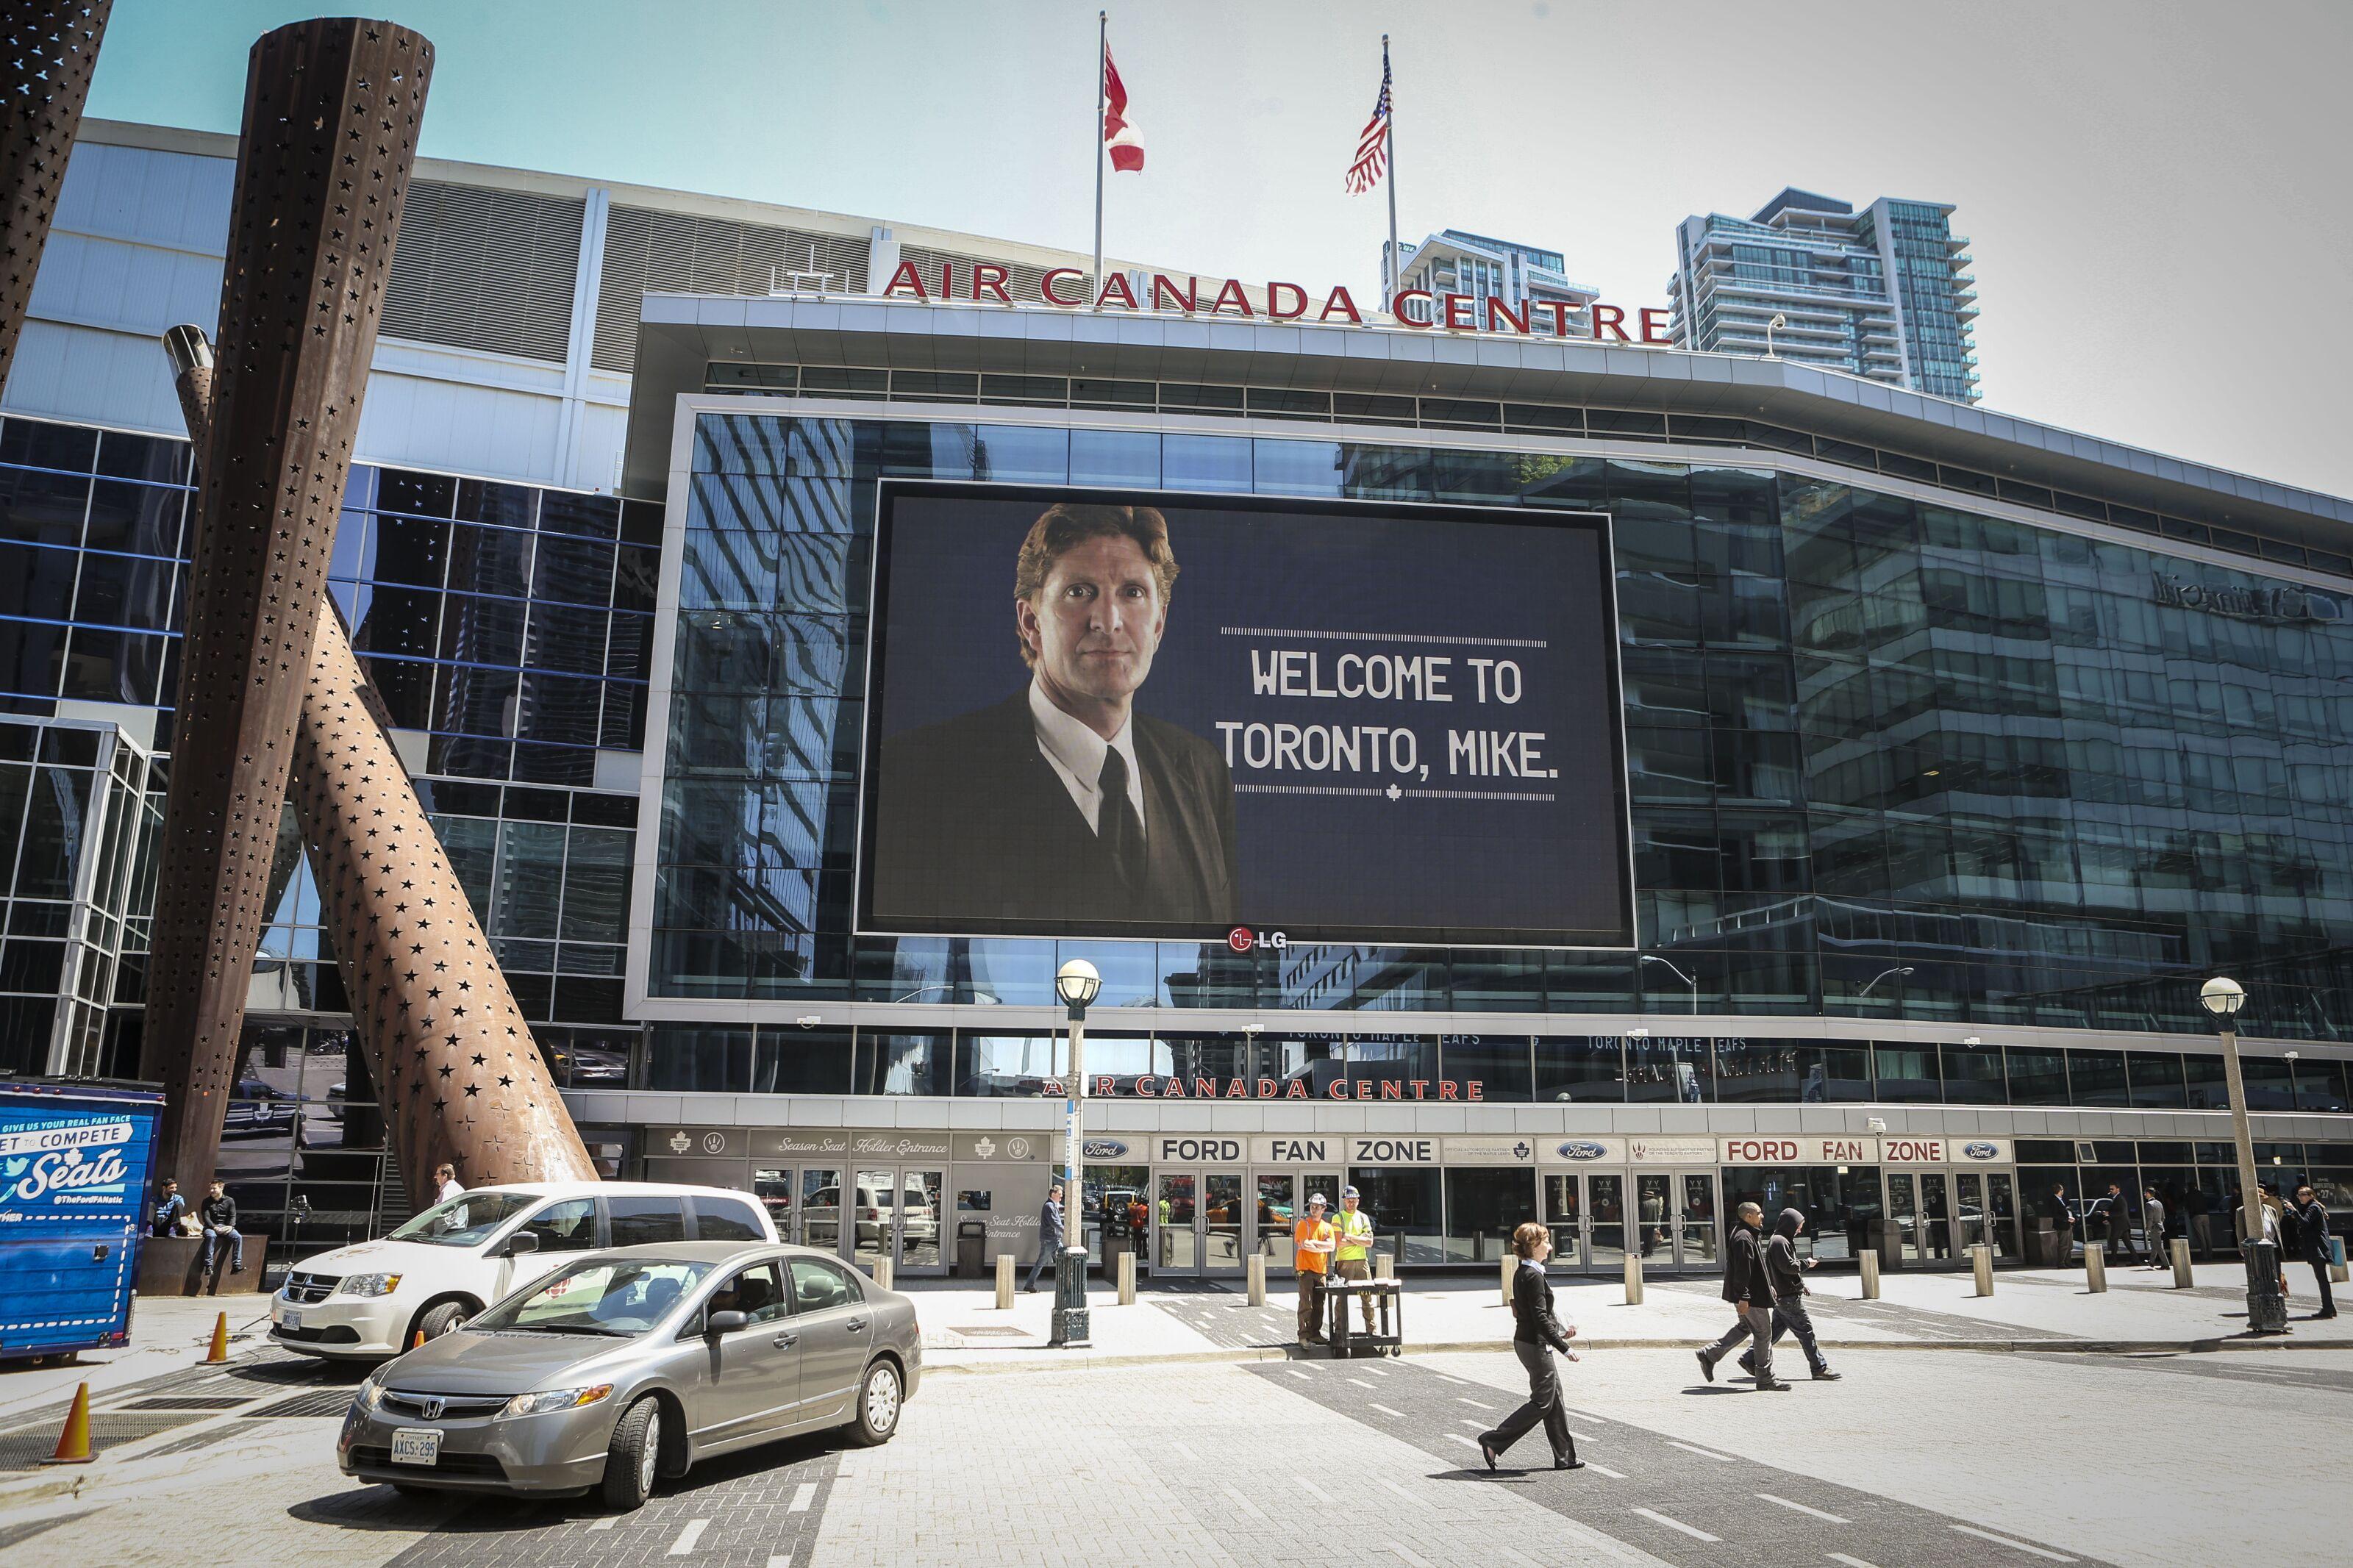 7dc75b83f55 Toronto Maple Leafs  No Longer the Air Canada Centre